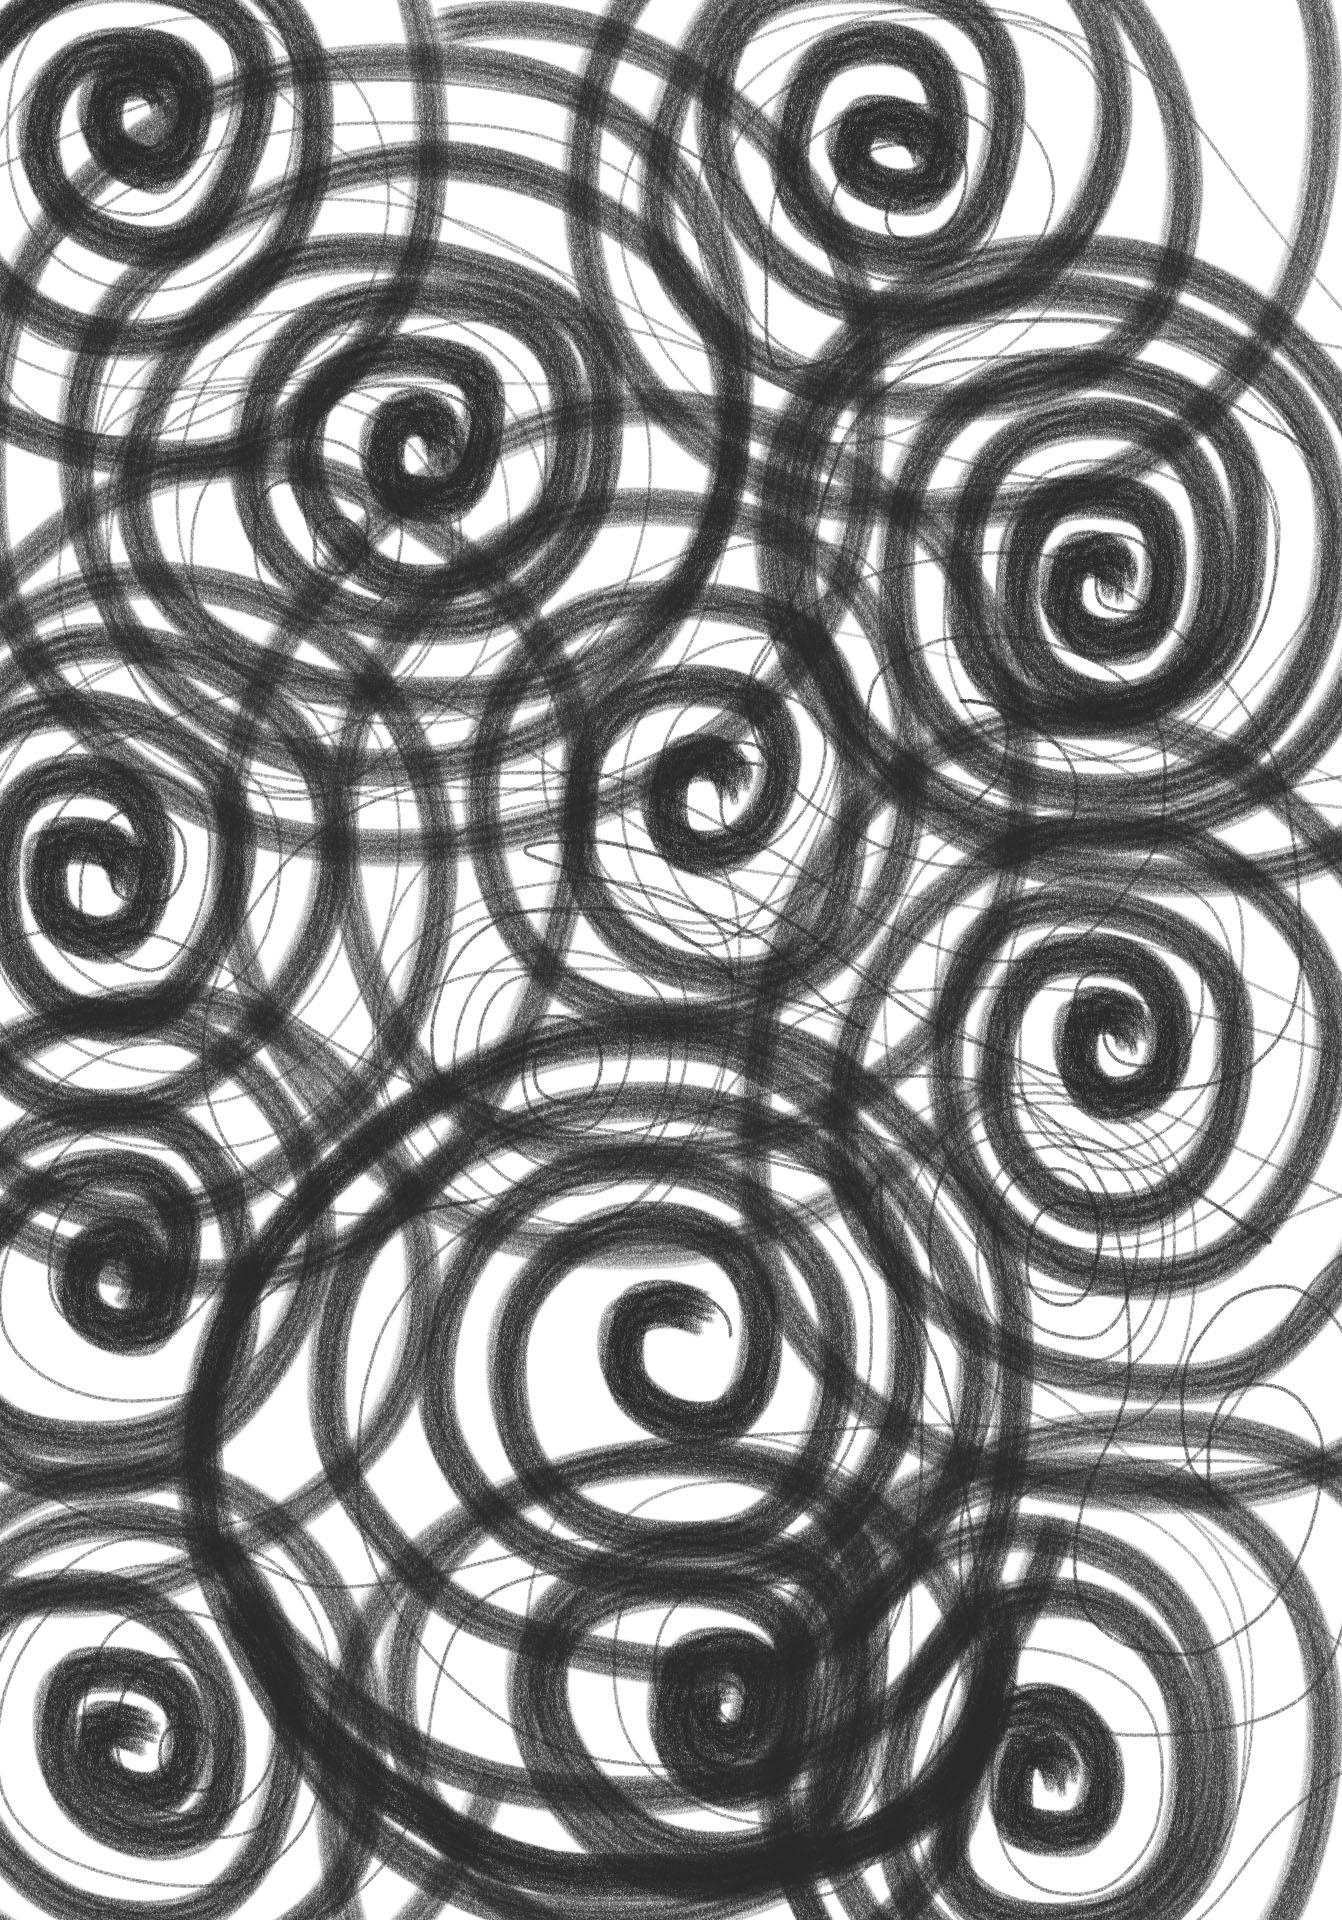 Spirals of Love , 2012, Digital Art